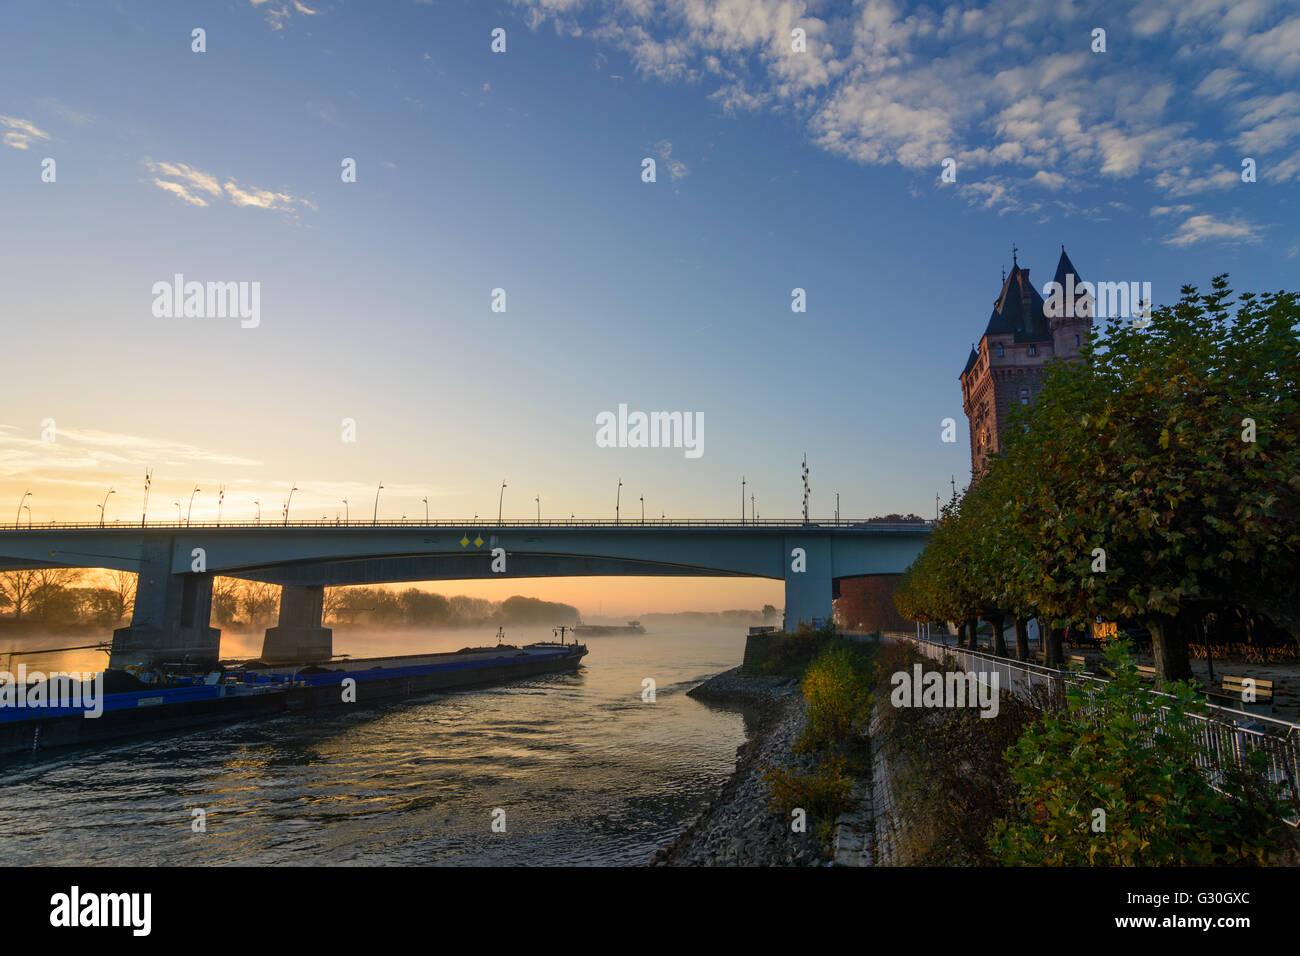 river Rhein (Rhine) at sunrise with Nibelungenbrücke , Nibelungen tower , cargo ship, Germany, hineland-Palatinate, - Stock Image